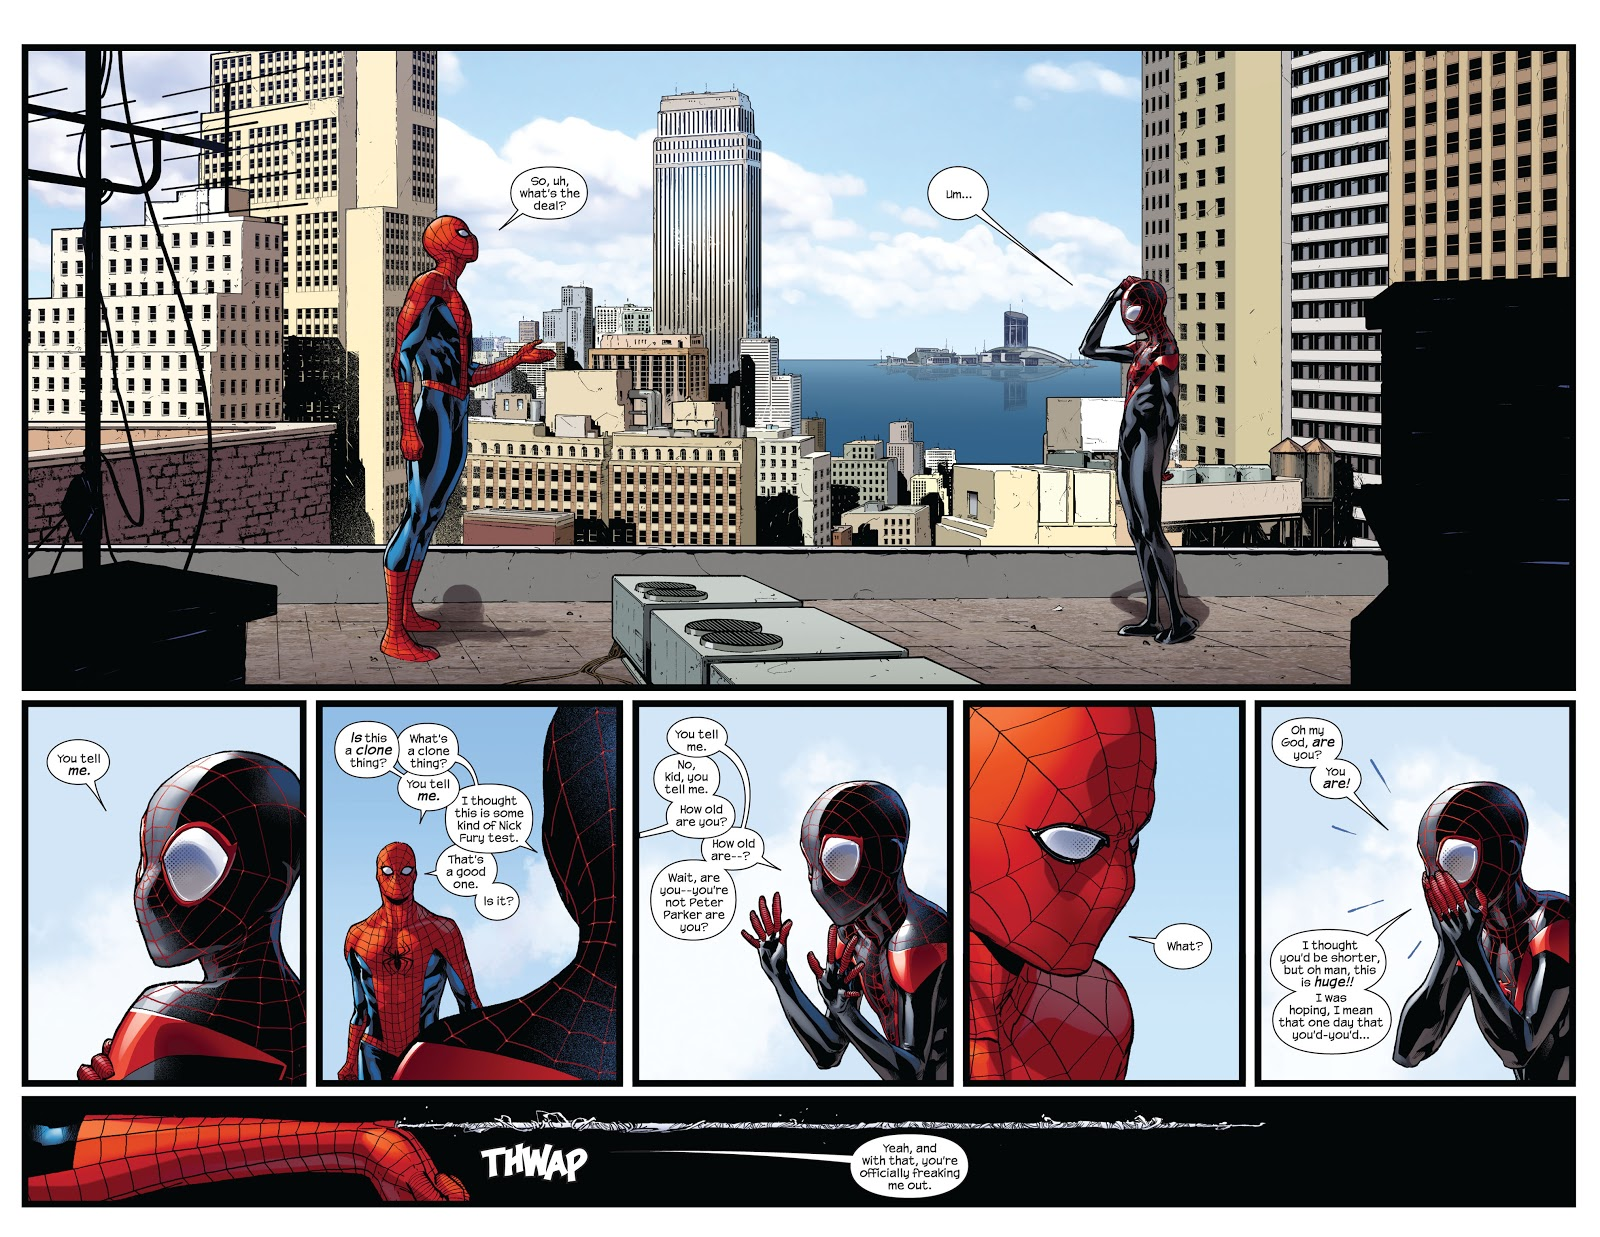 Spider-Men review